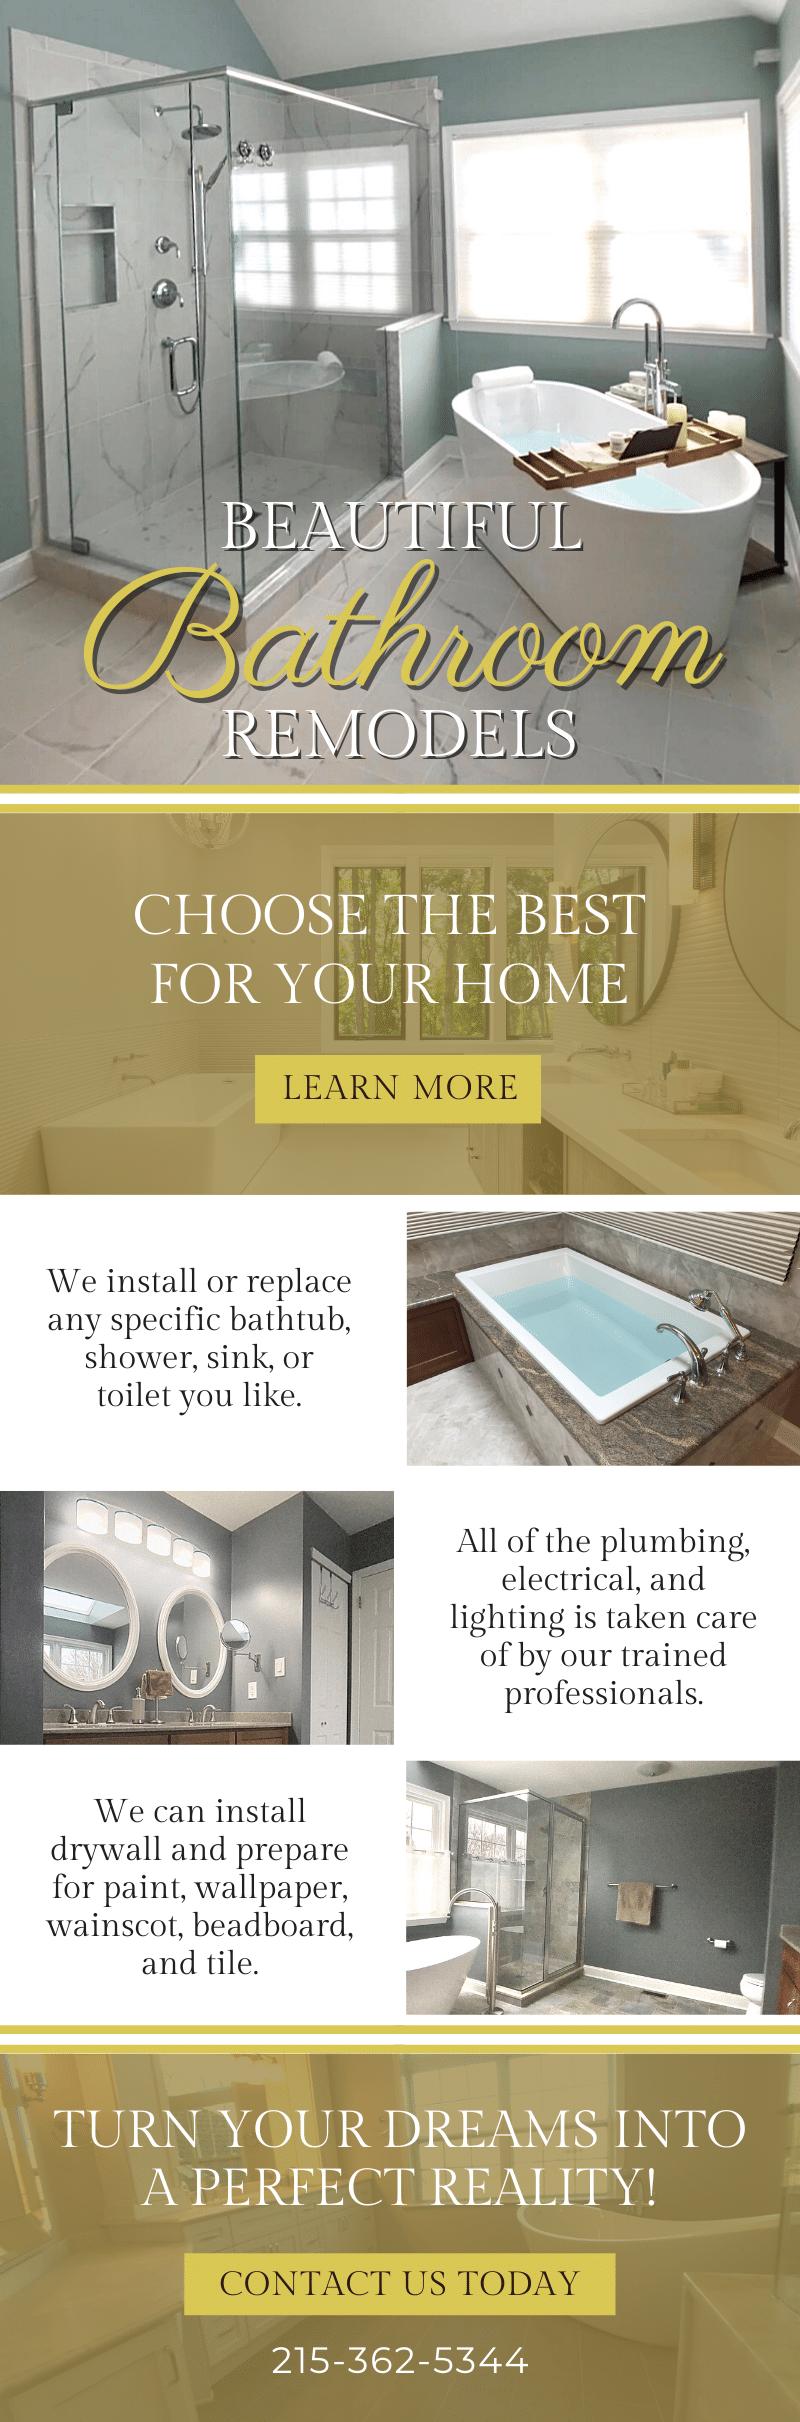 Beautiful Bathroom Remodels! 3